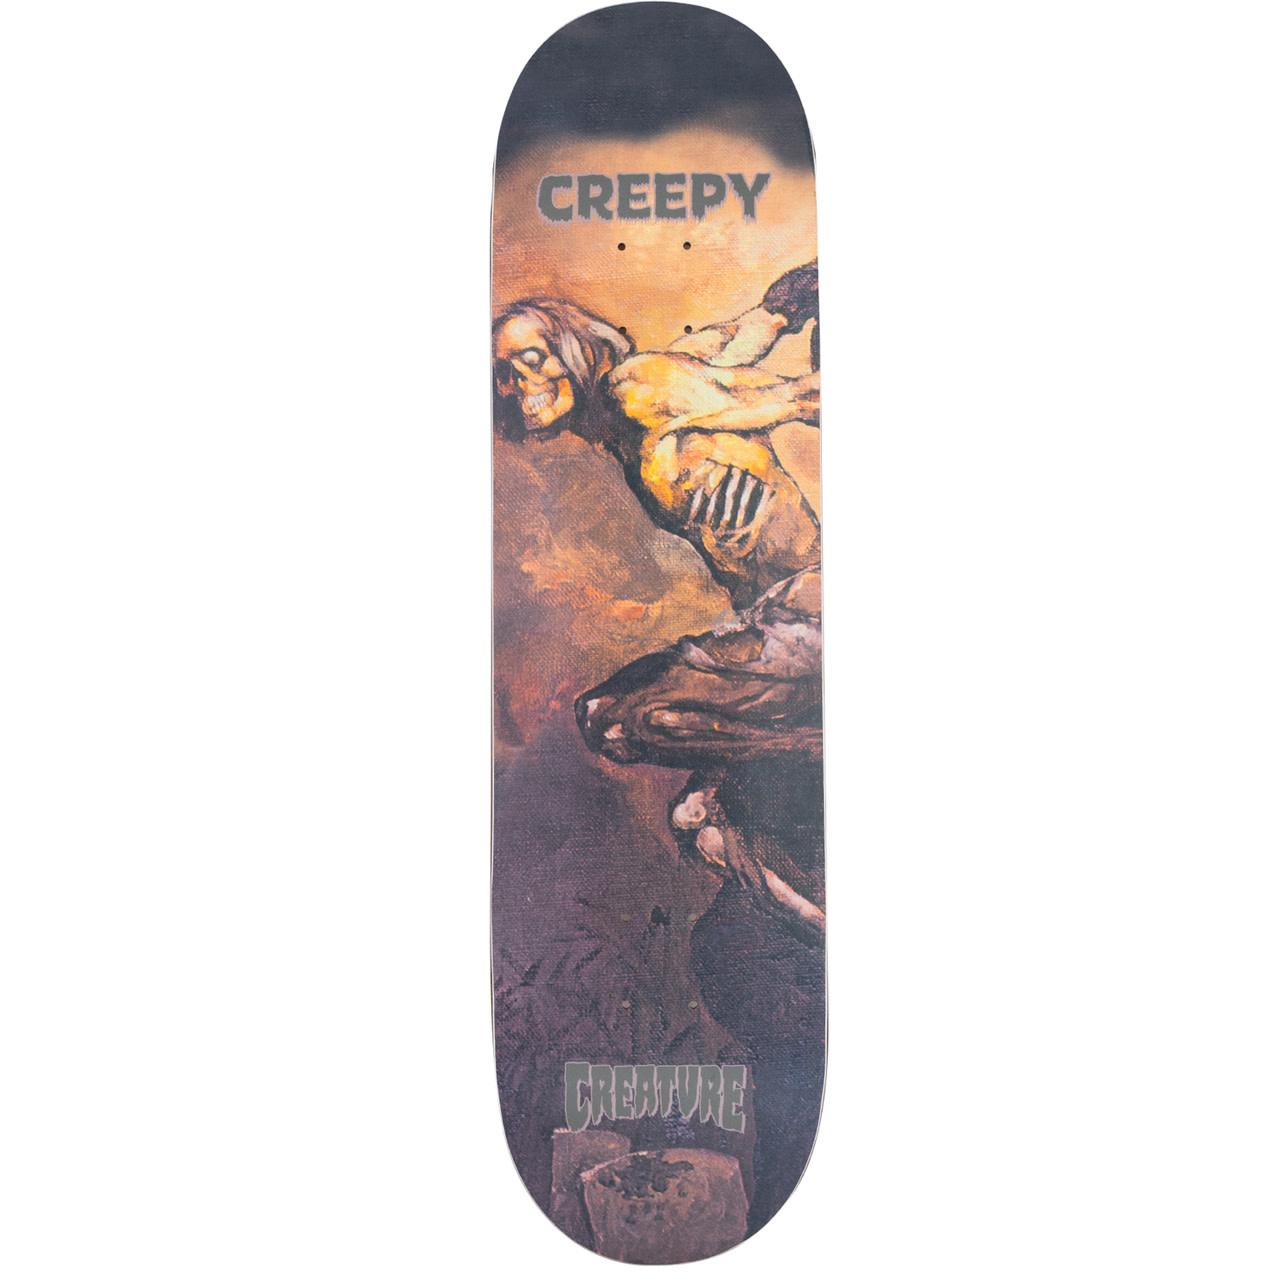 Creature DECK-CREATURE CREEPY ETERNITY EVERSLICK (8.25)